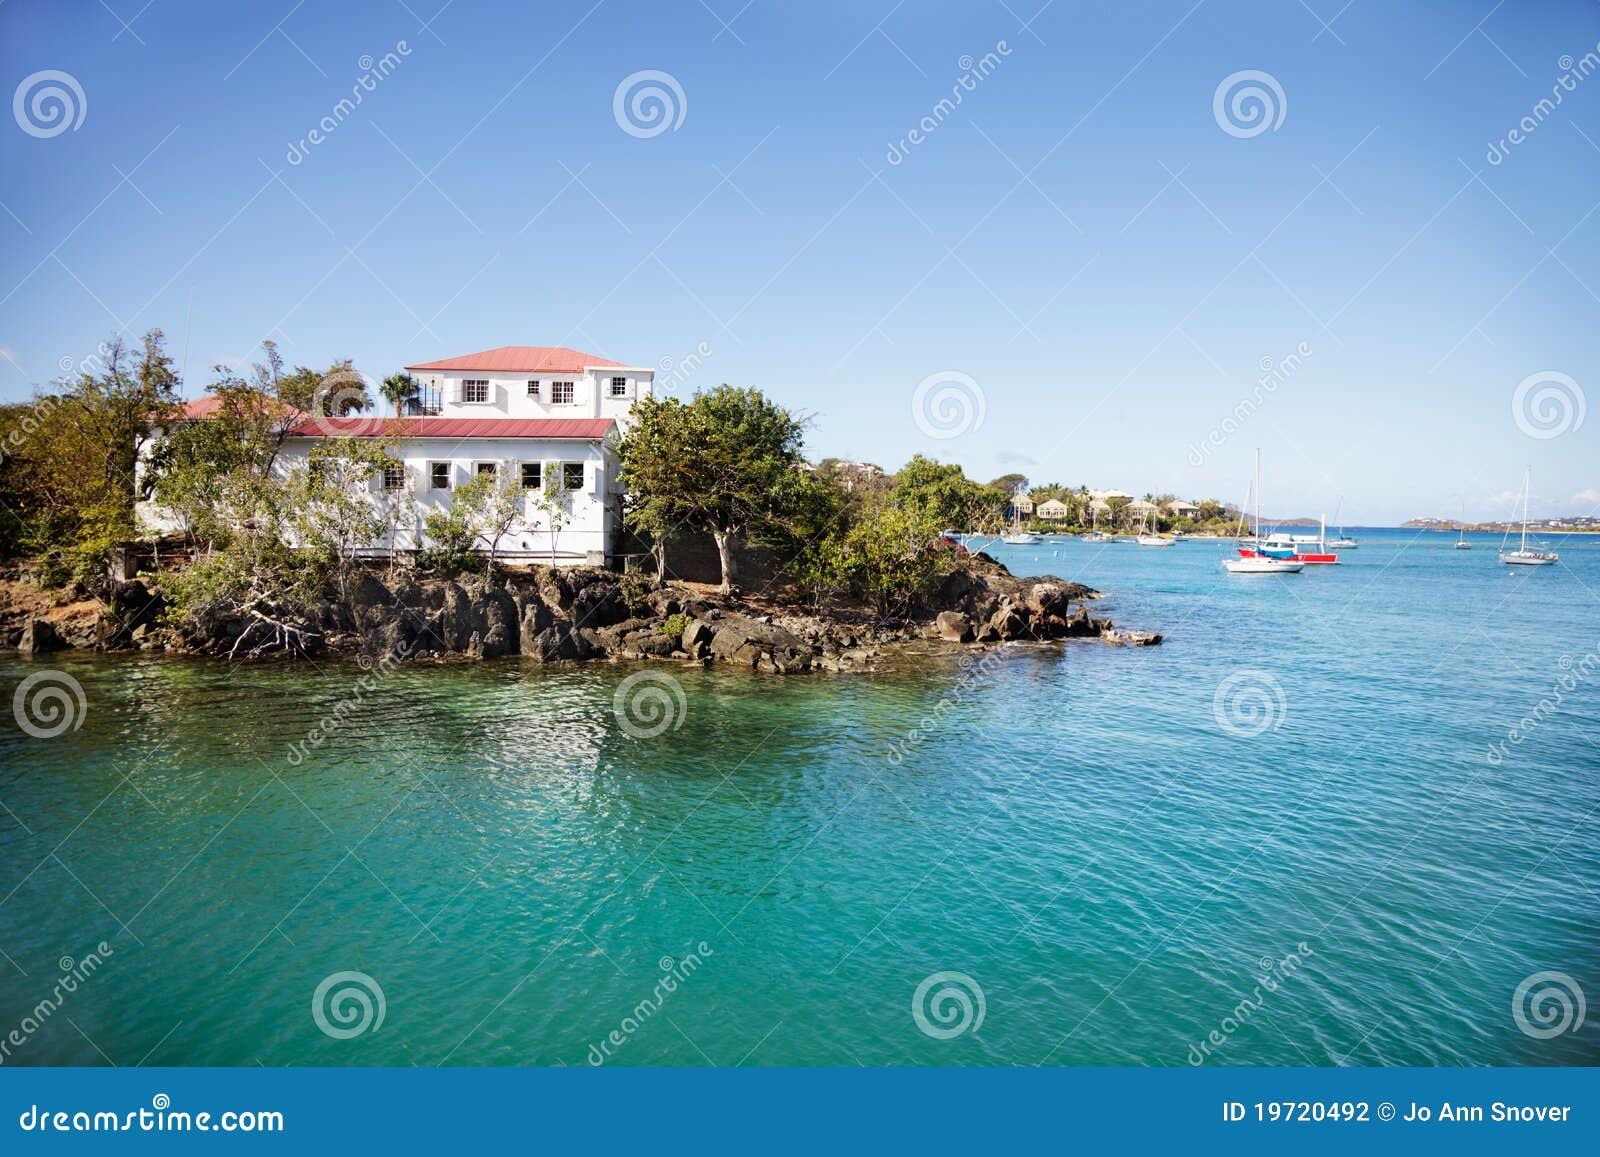 Eiland in Baai Cruz